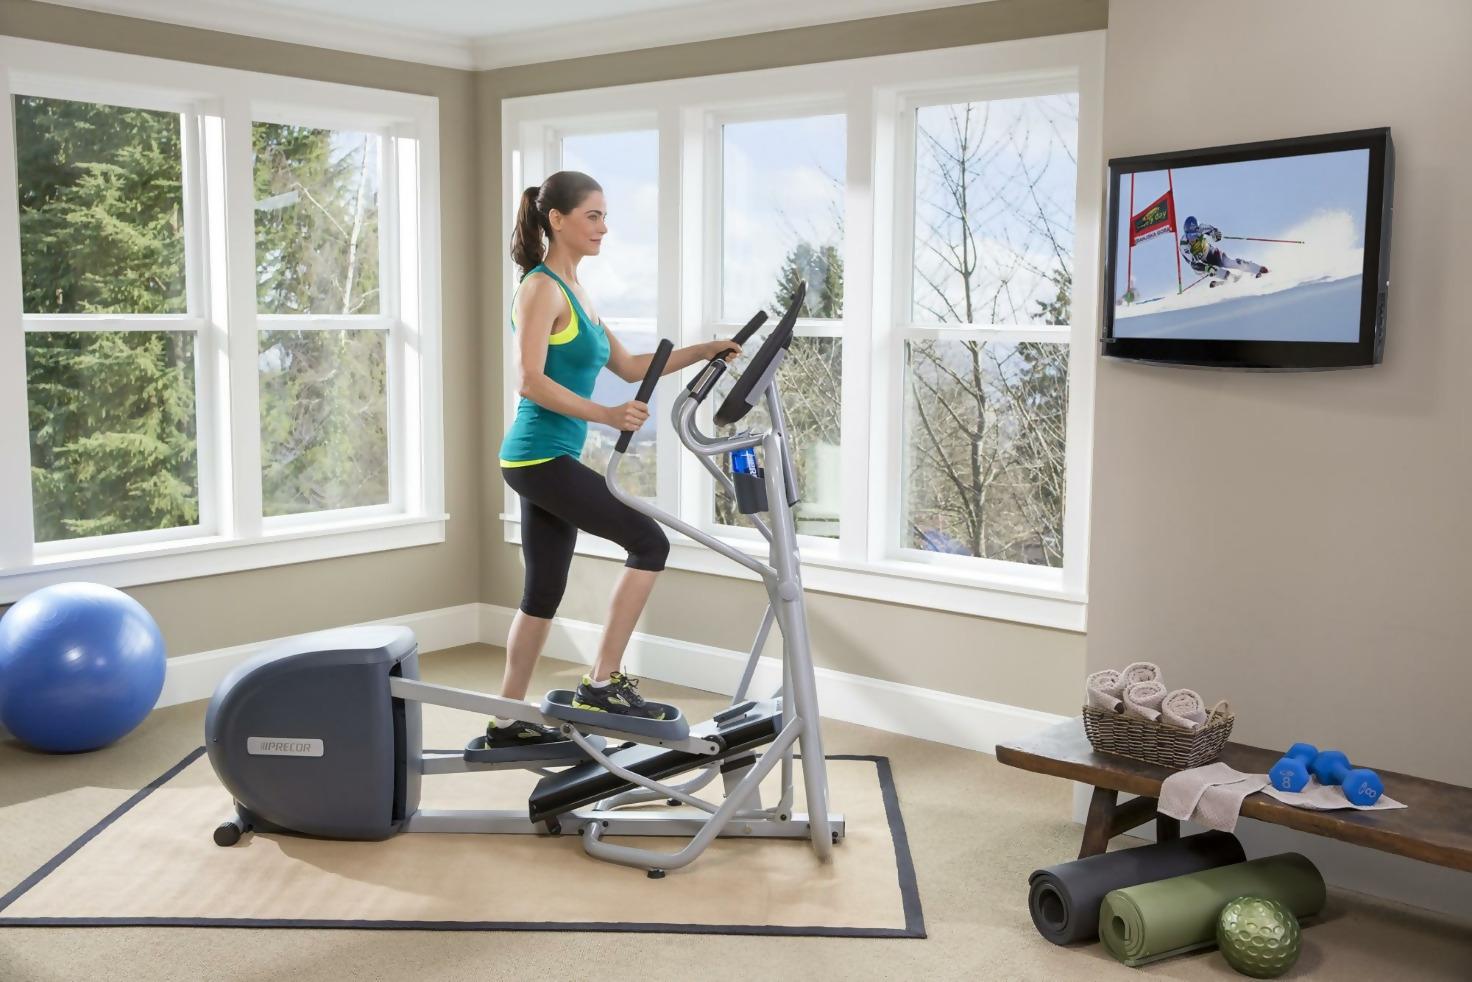 Choosing A Home Exercise Program